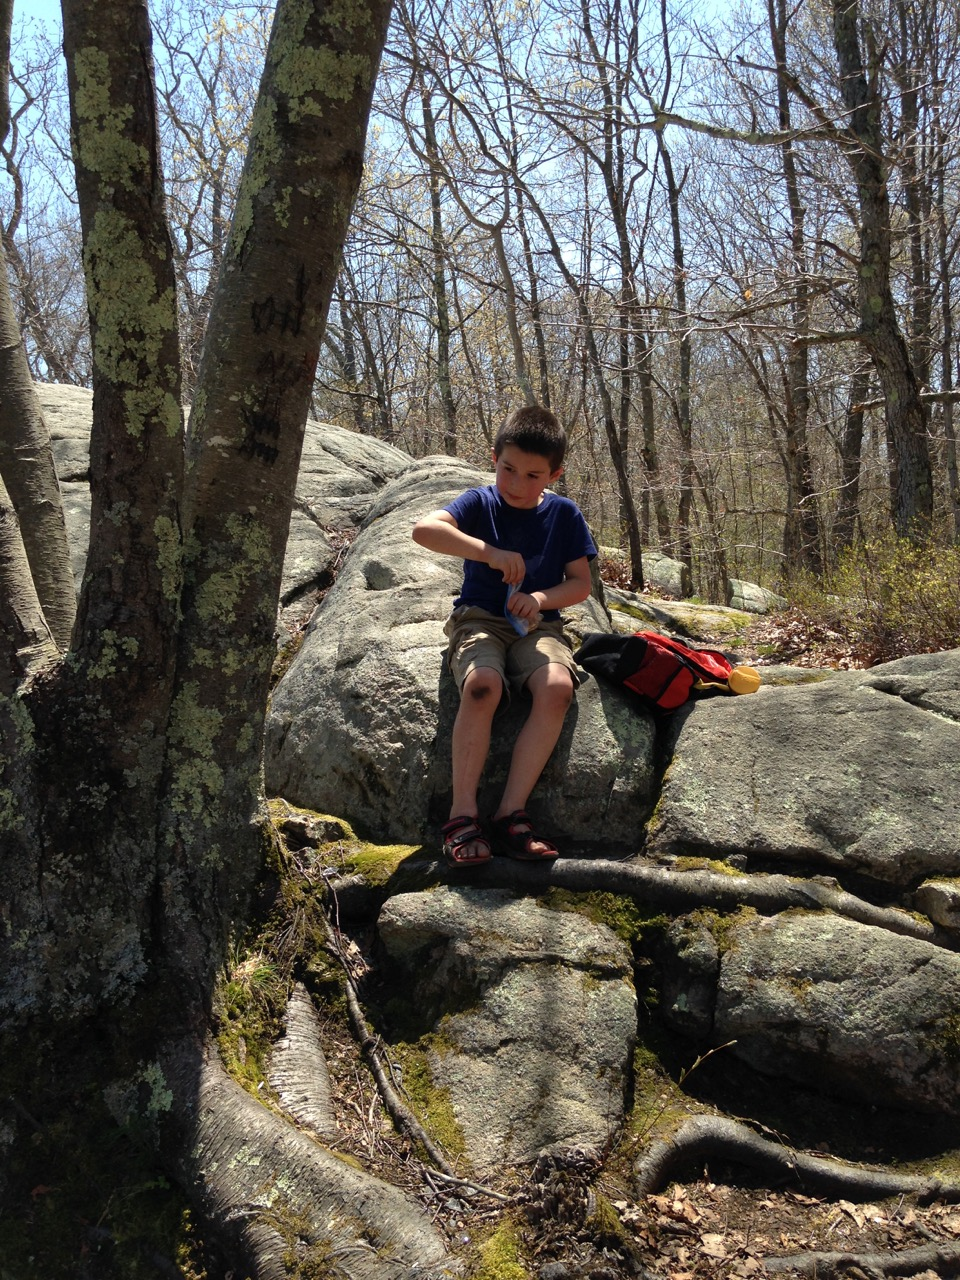 Ben picnics on the rock.